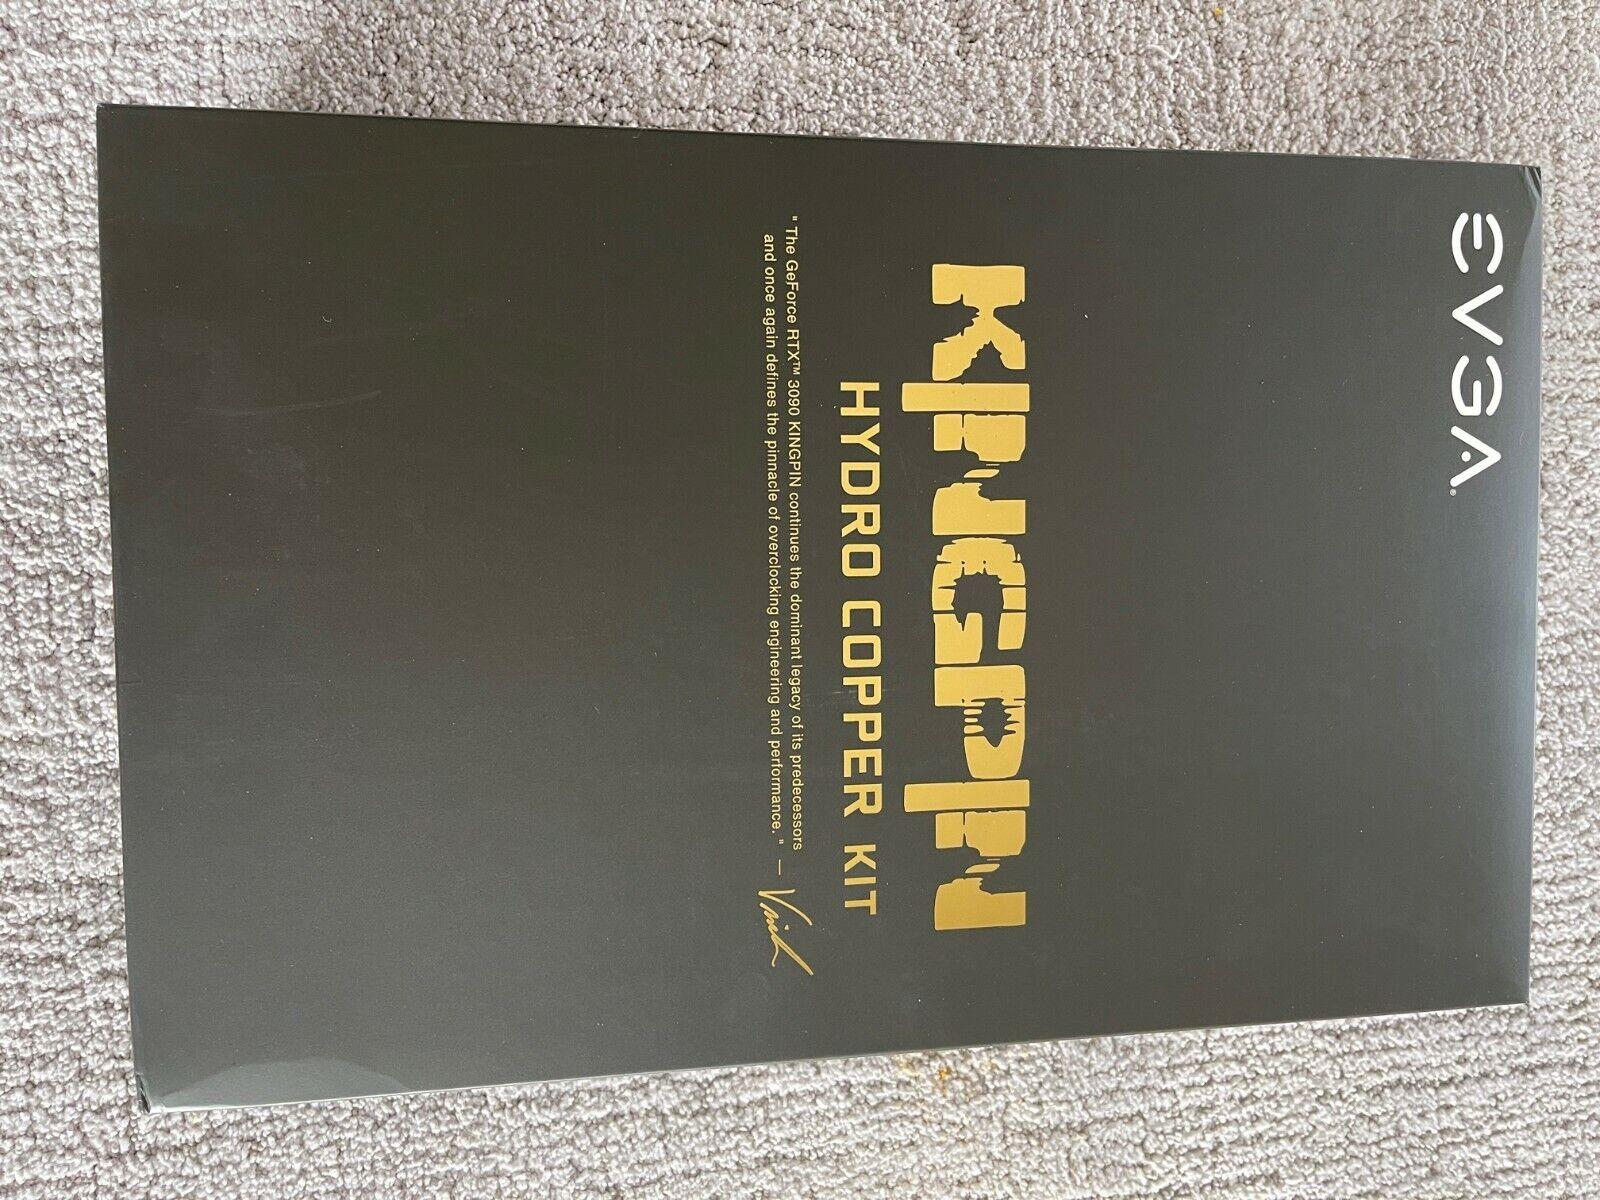 EVGA KINGPIN RTX 3090 HydroCopper Kit Waterblock Only, No Card , NEW  - $820.00